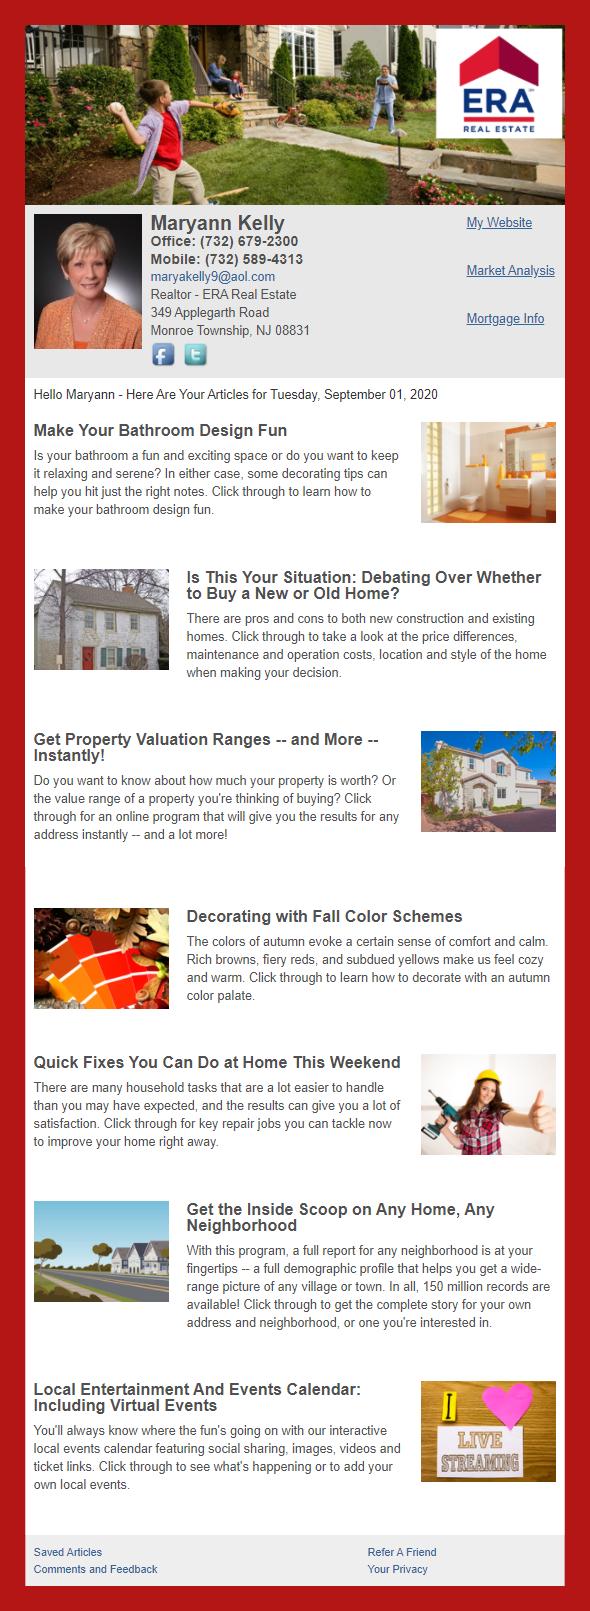 ERA Real Estate - HomeActions Sample Email Newsletter